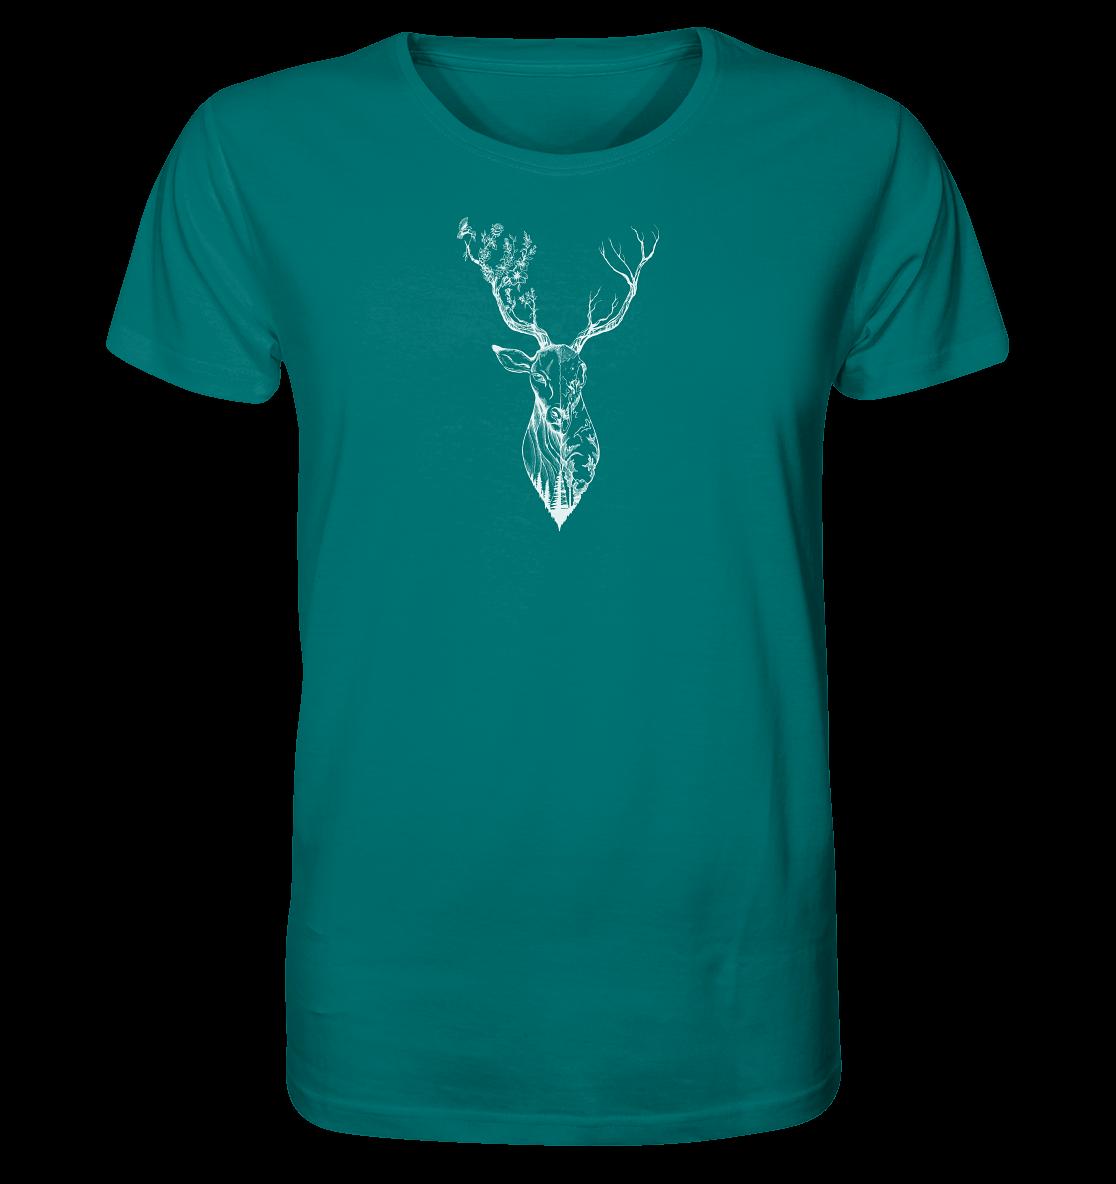 front-organic-shirt-007373-1116x-15.png